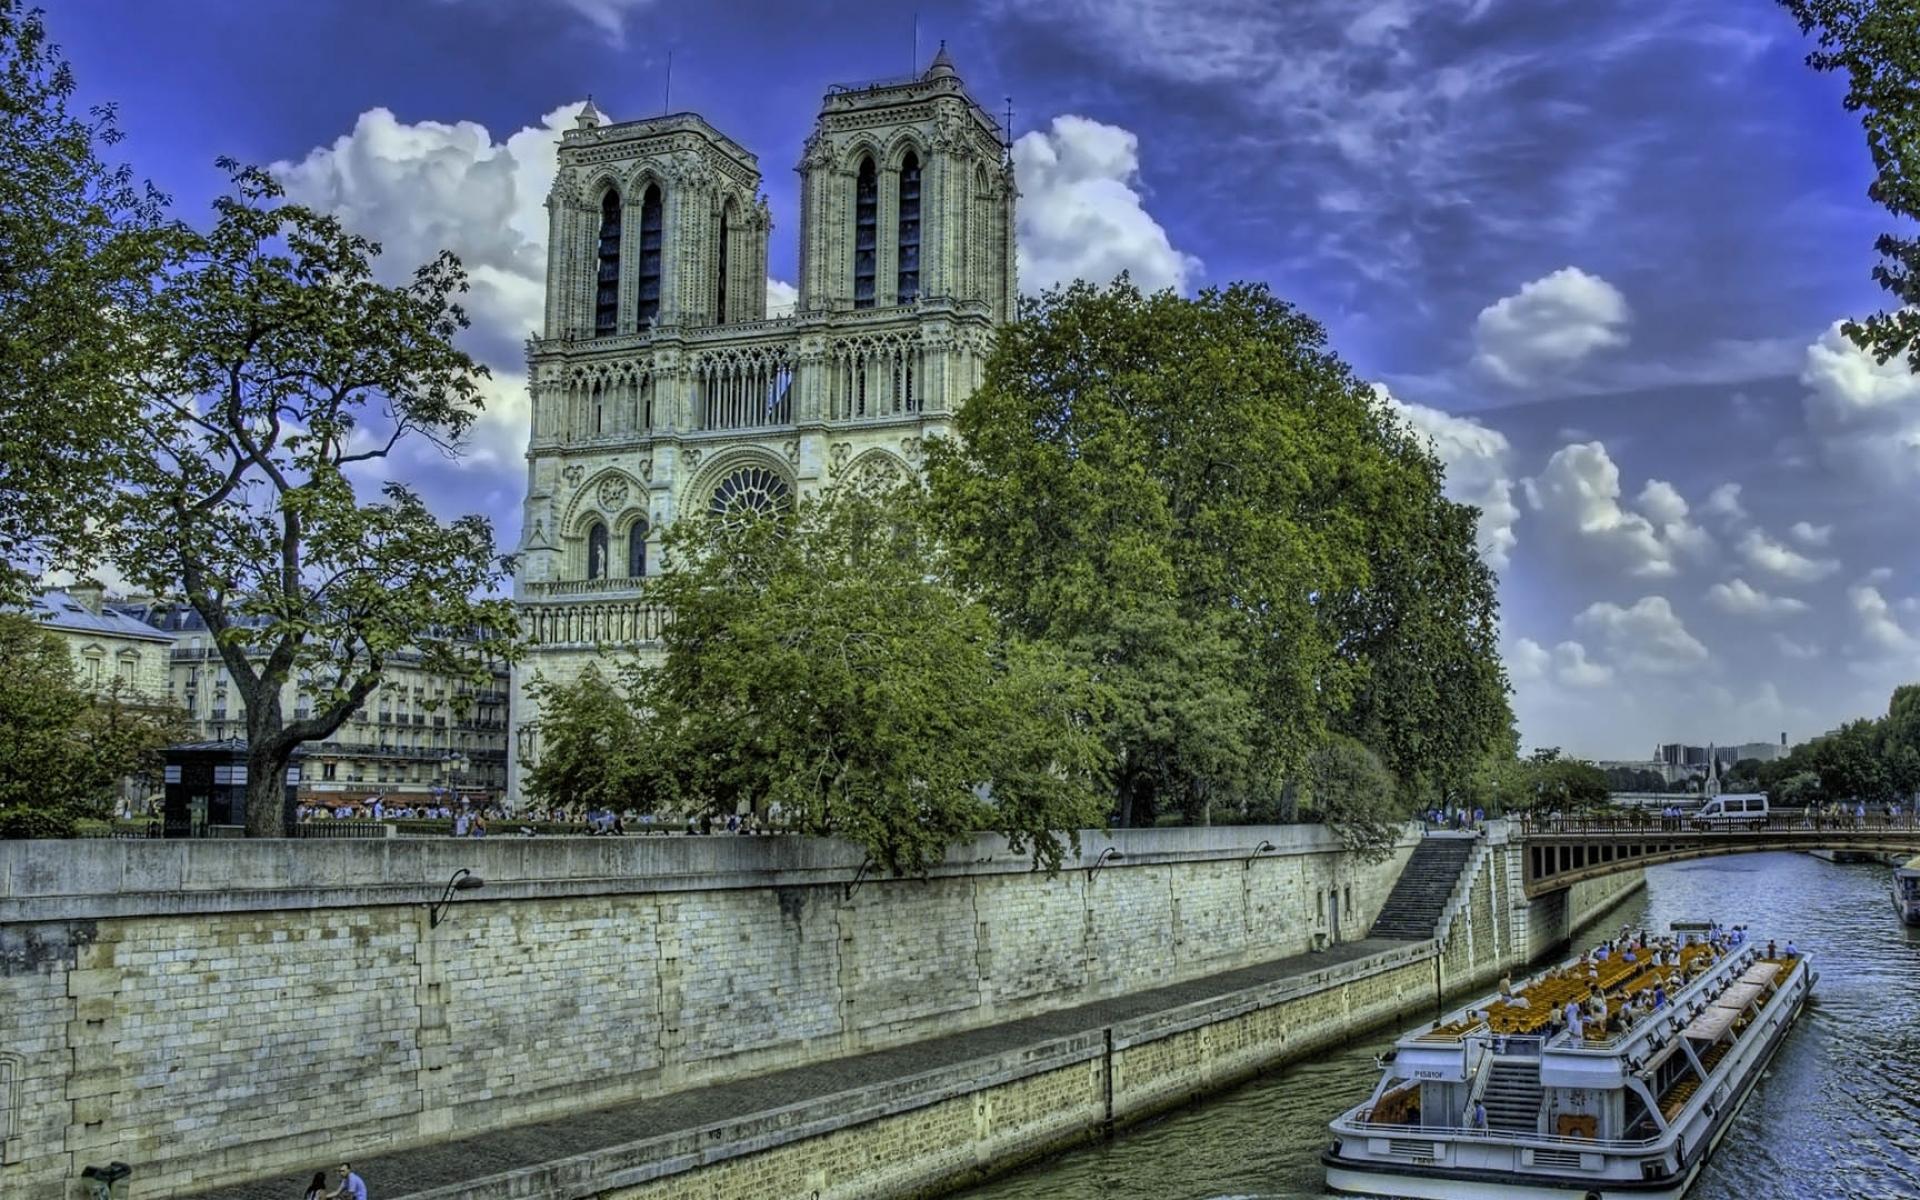 Картинки Notre dame de paris, paris, france, river, building, hdr фото и обои на рабочий стол